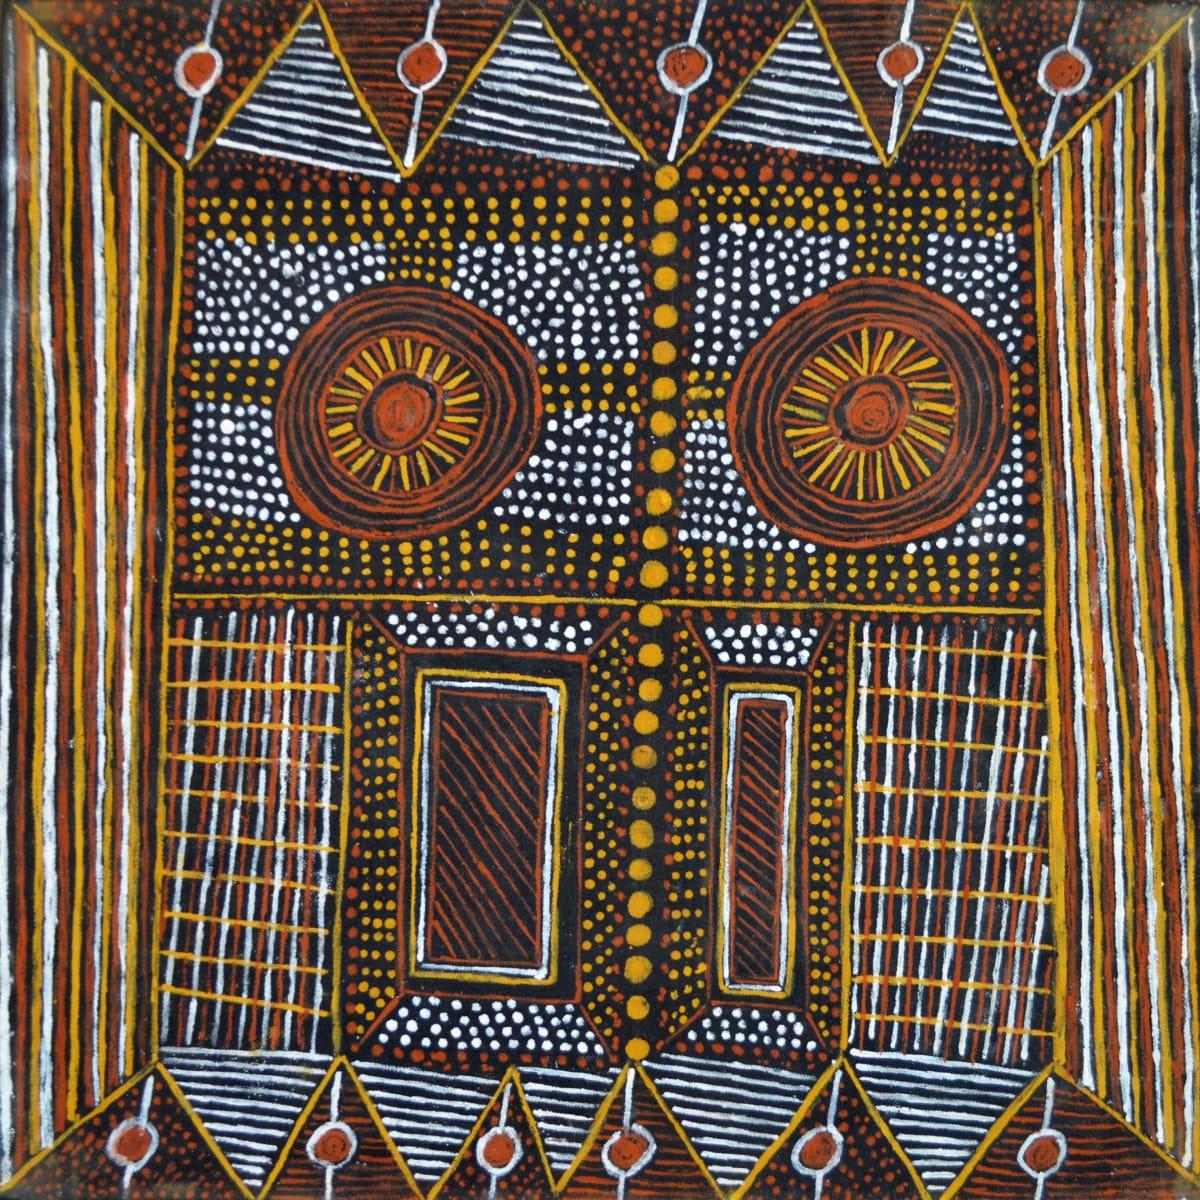 Pamela Brooks Parlini Jilamara natural ochres on canvas 45 x 45 cm